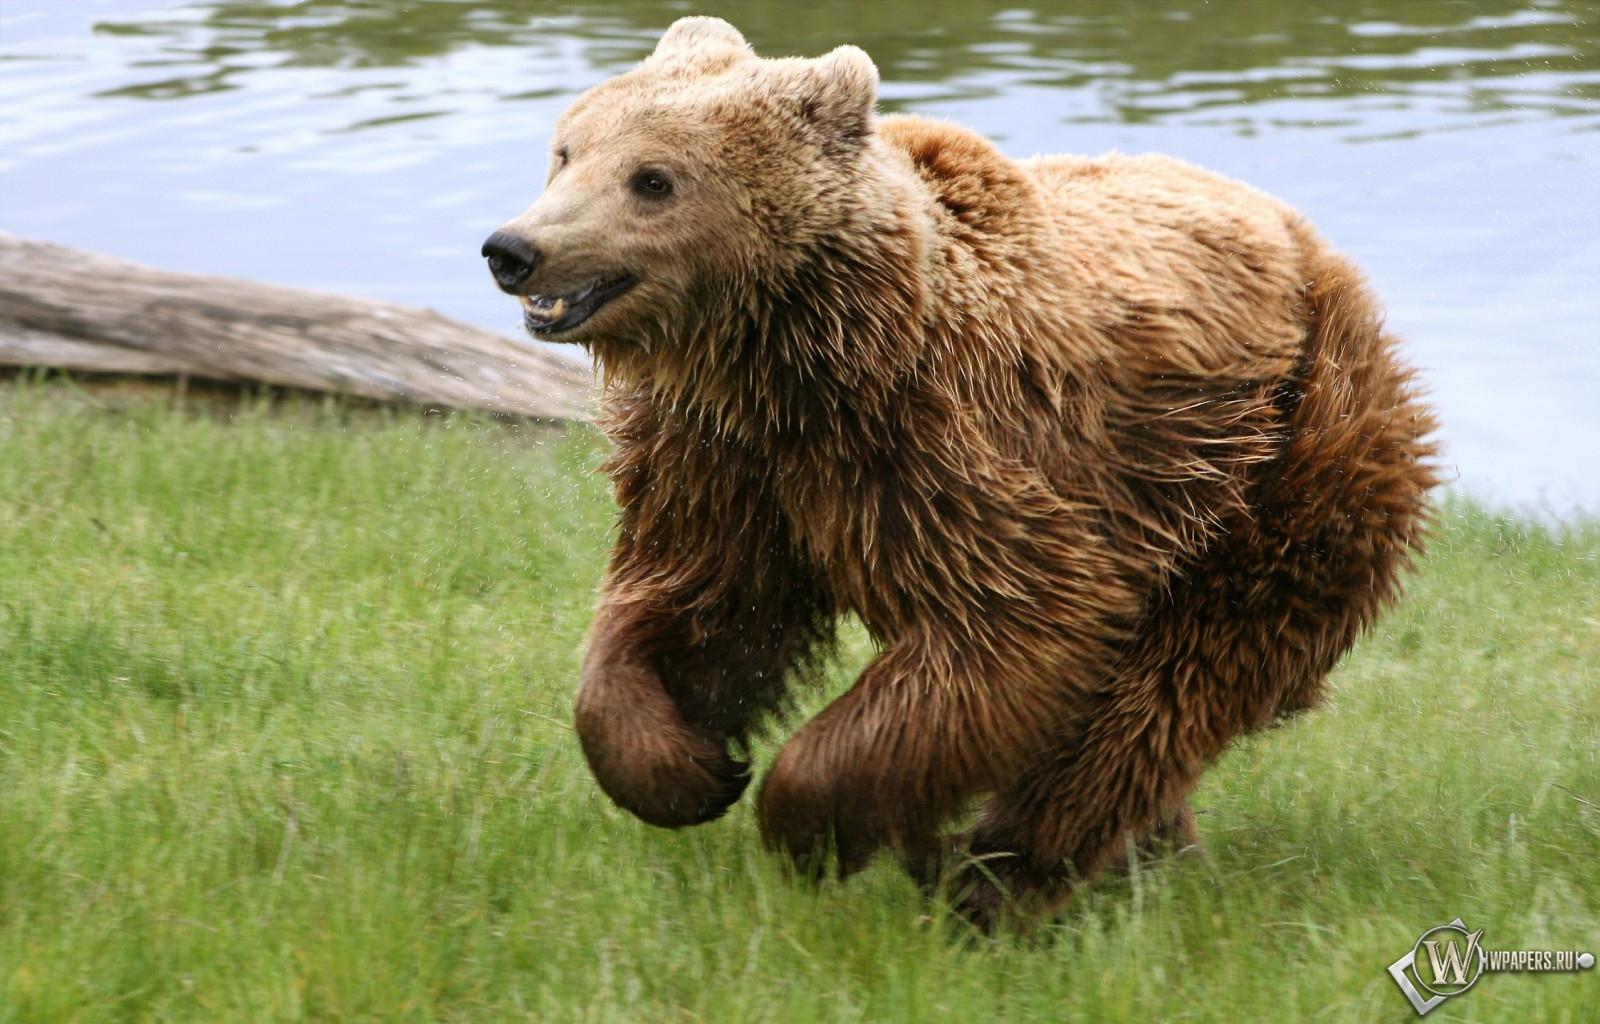 Медведь играет на траве 1600x1024